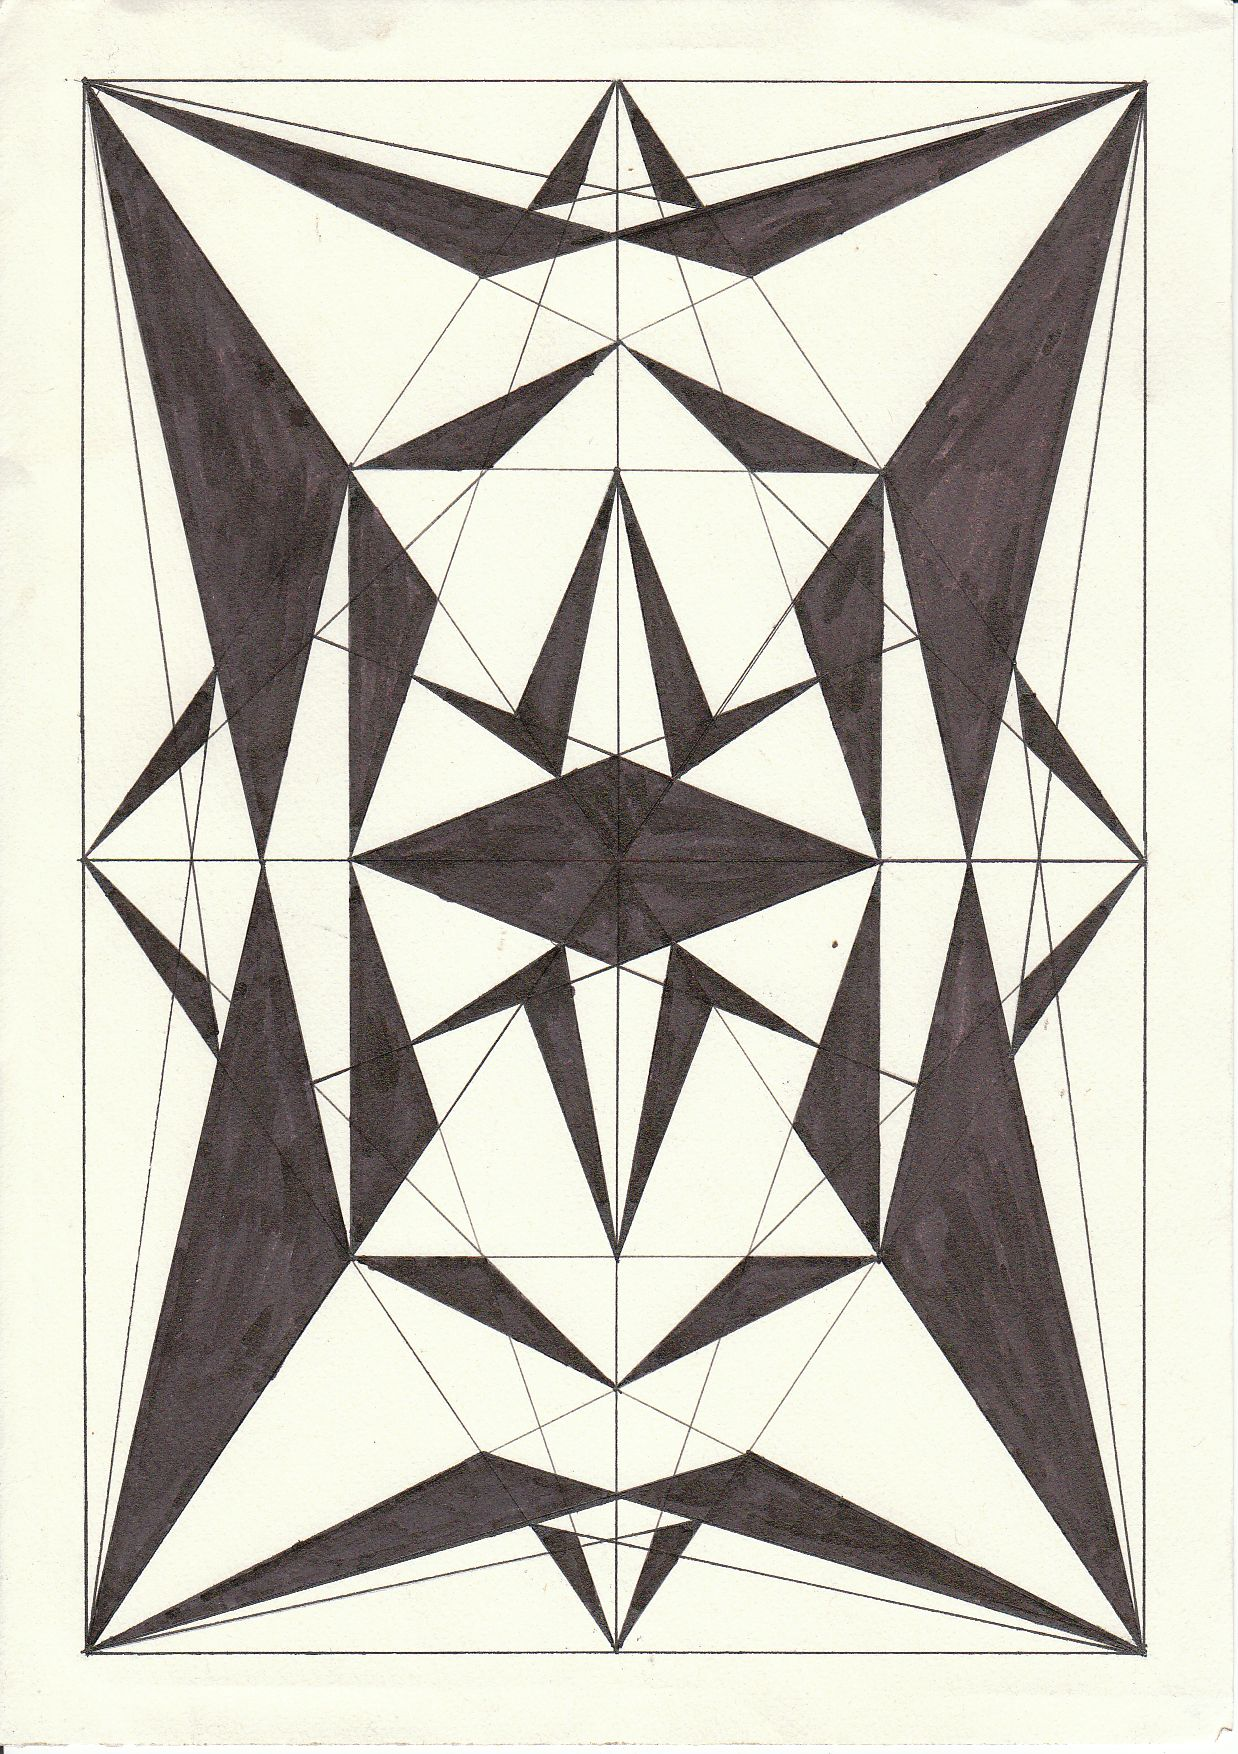 1238x1754 Triangles Drawing Etc. Etc. Etc.